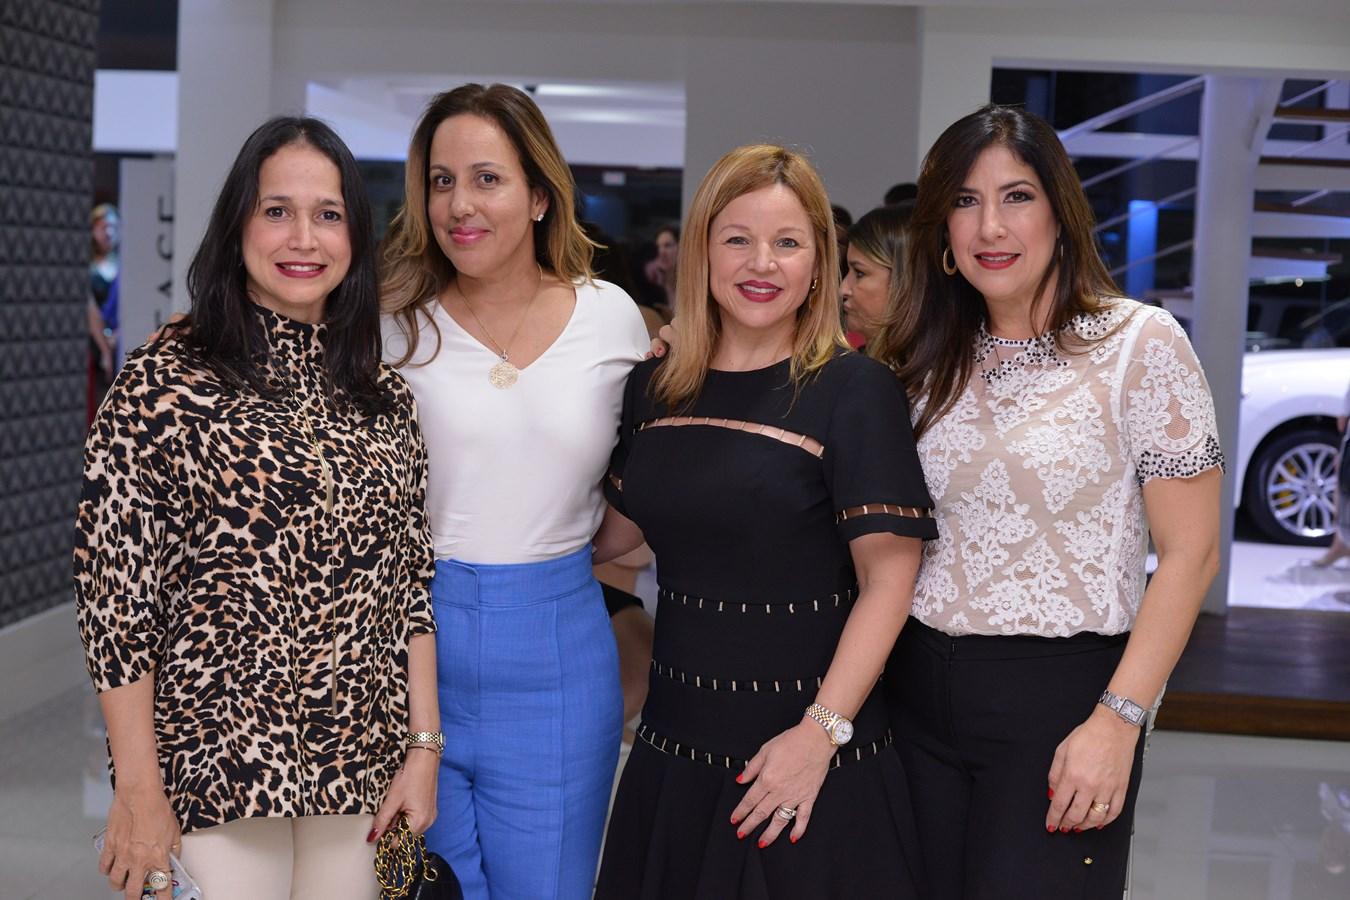 Anna karina Cuello de Moya,Maria Turull de Bisono,Monserrat Puig,Patricia Garcia